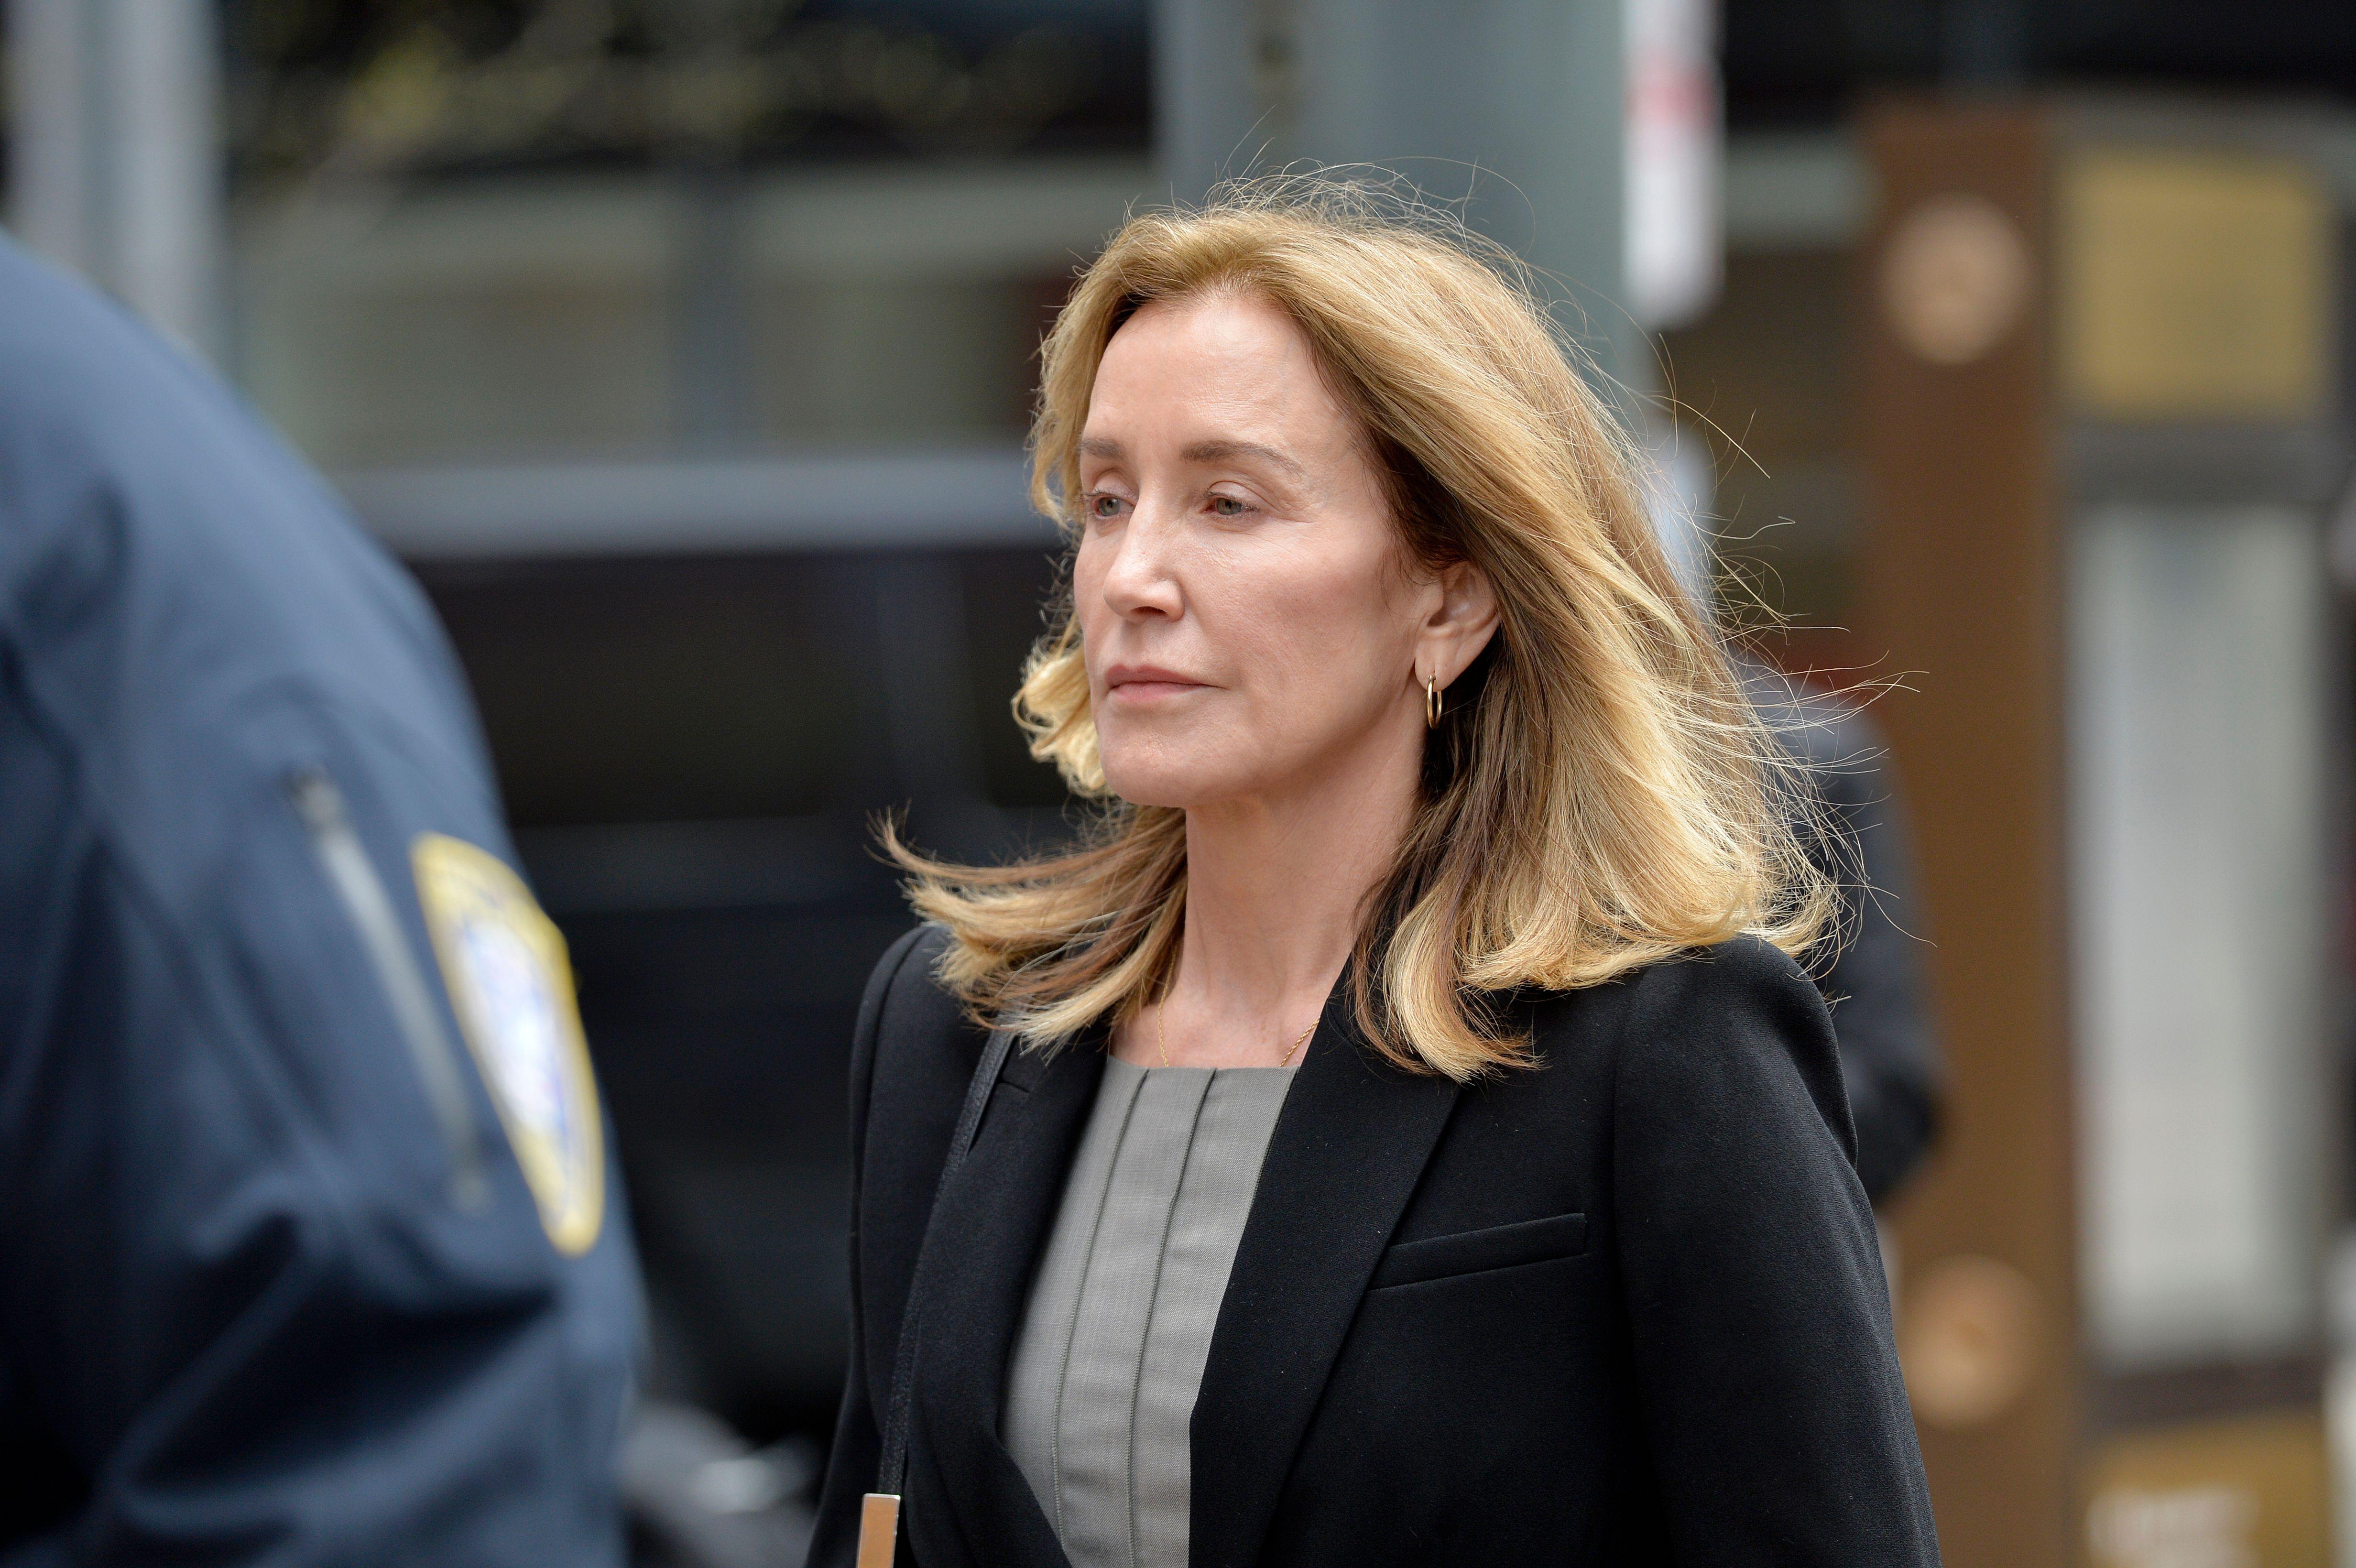 Desperate Housewives star Felicity Huffman gets prison sentence over university scandal